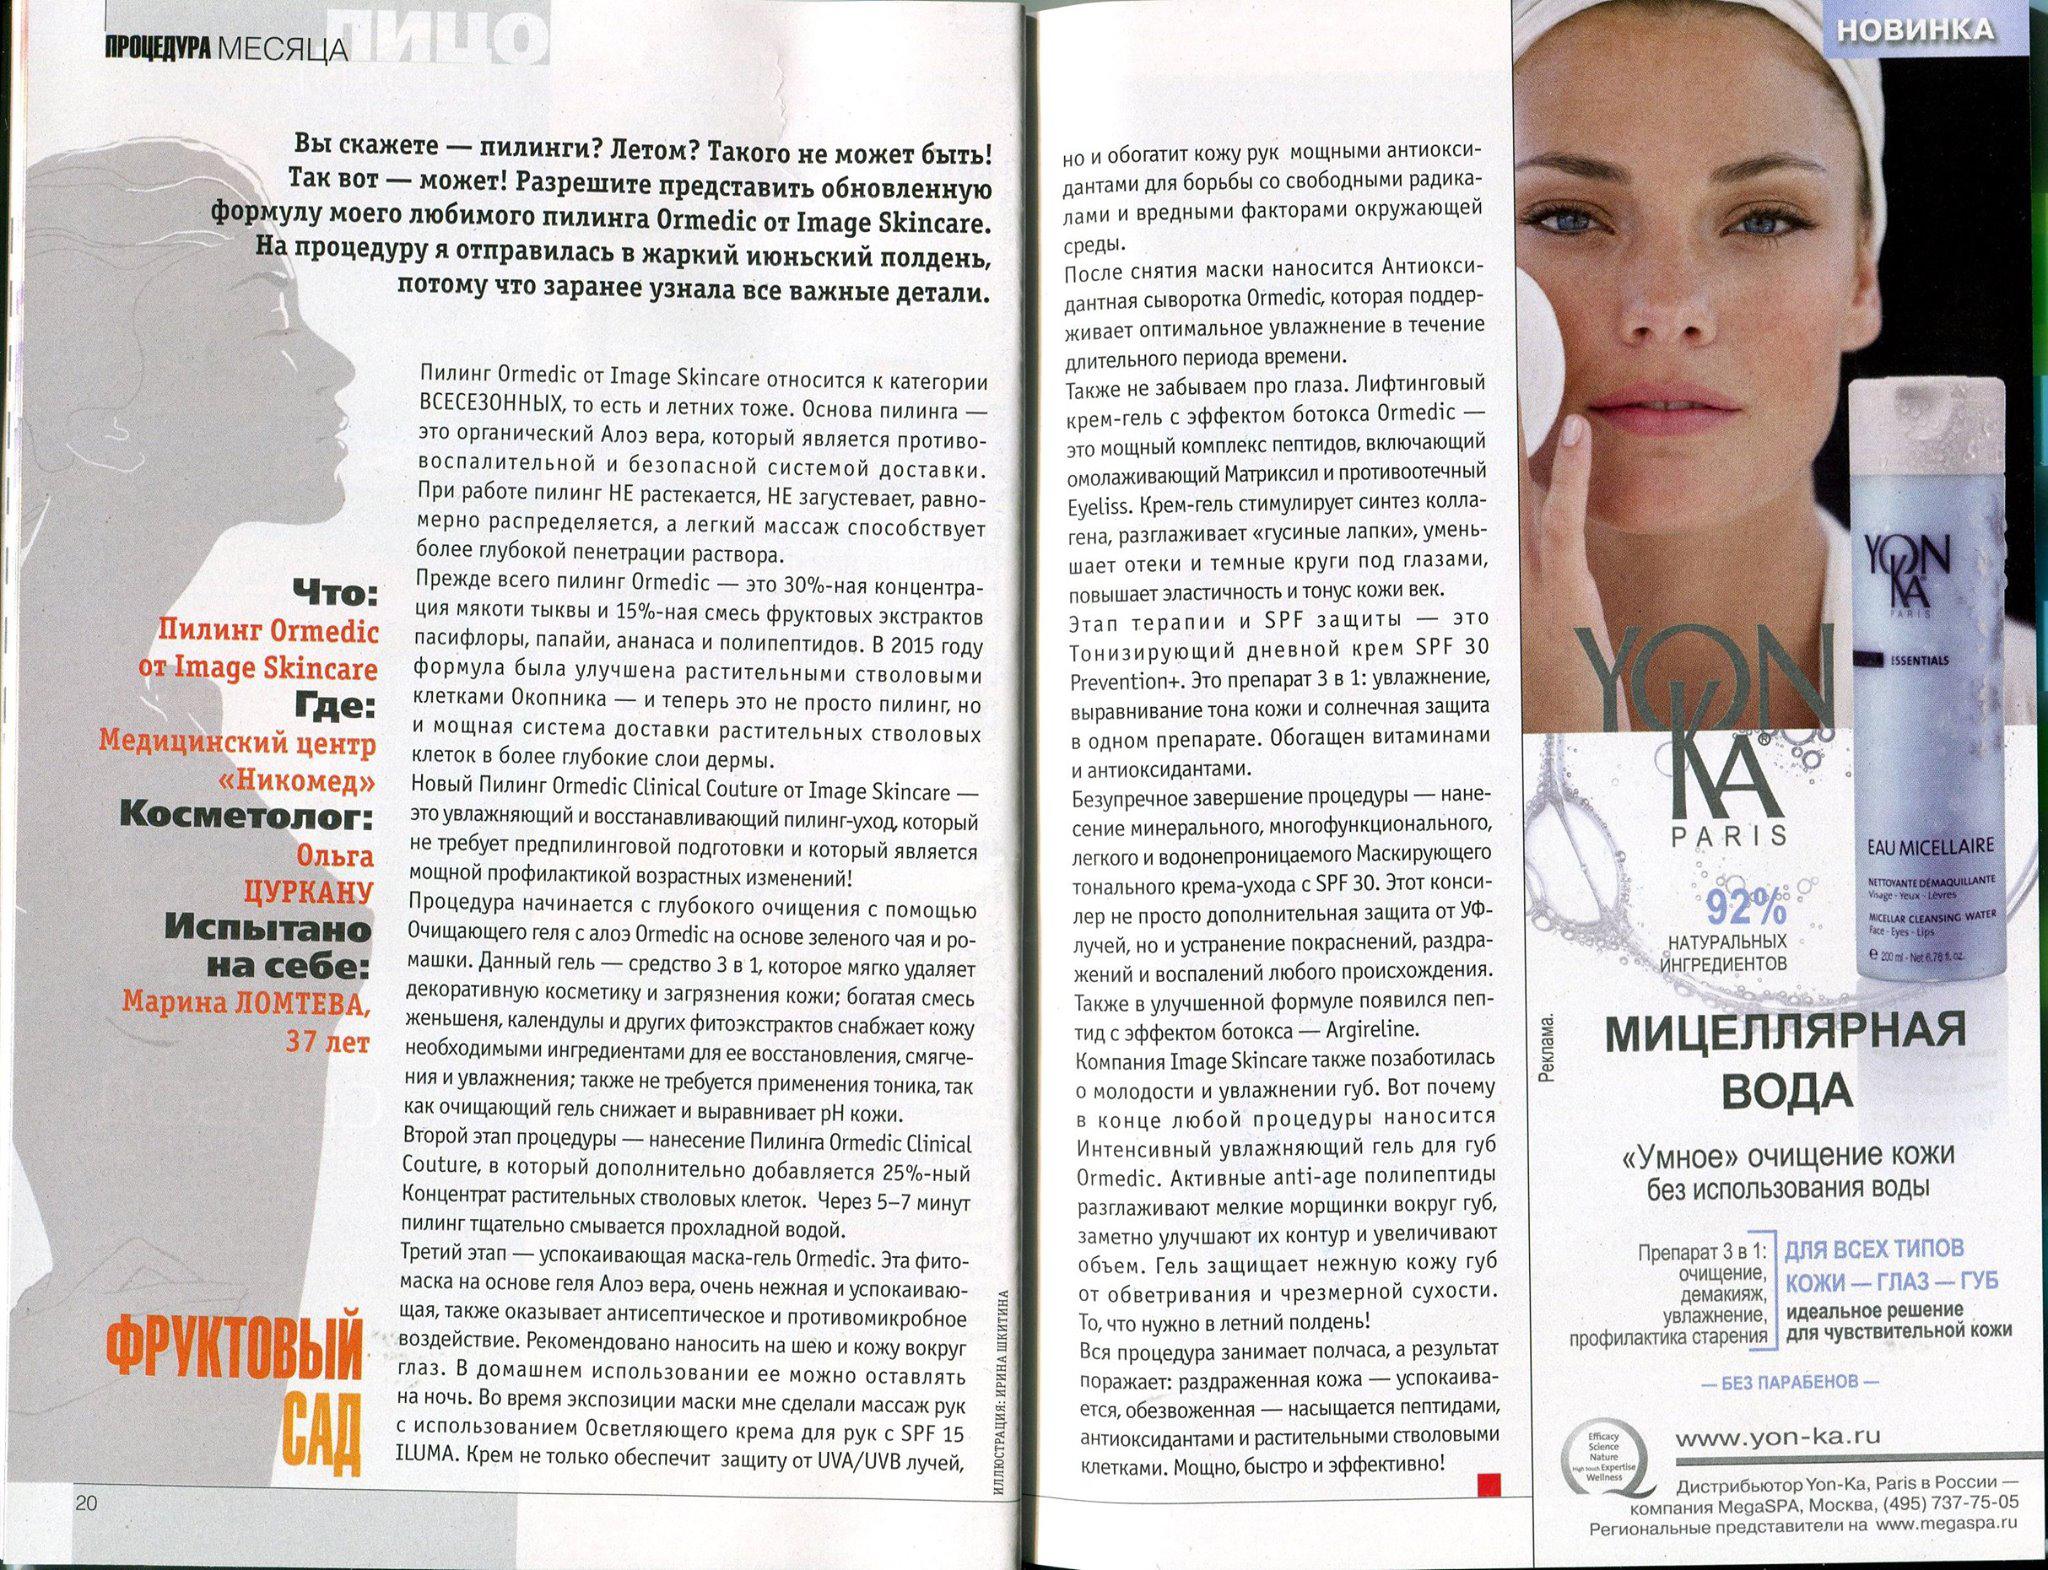 Пилинг Ormedic от IMAGE Skincare